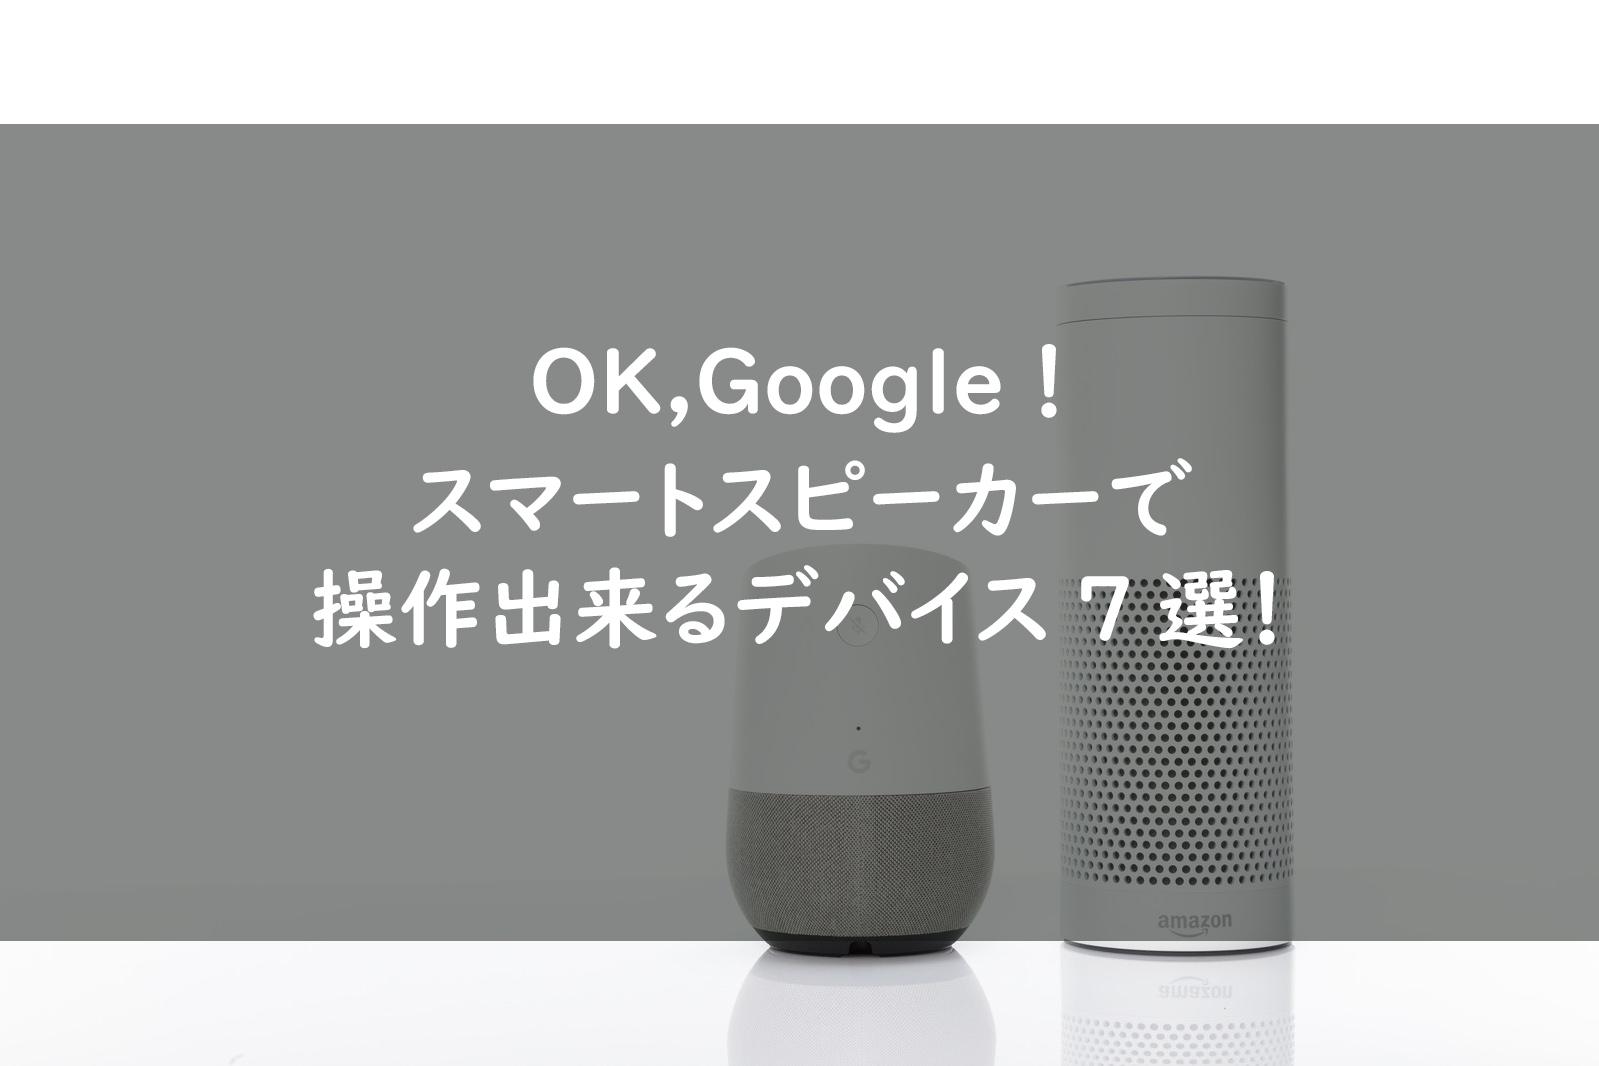 OK Googleで生活をハック!音声操作出来るIoTデバイス7選!